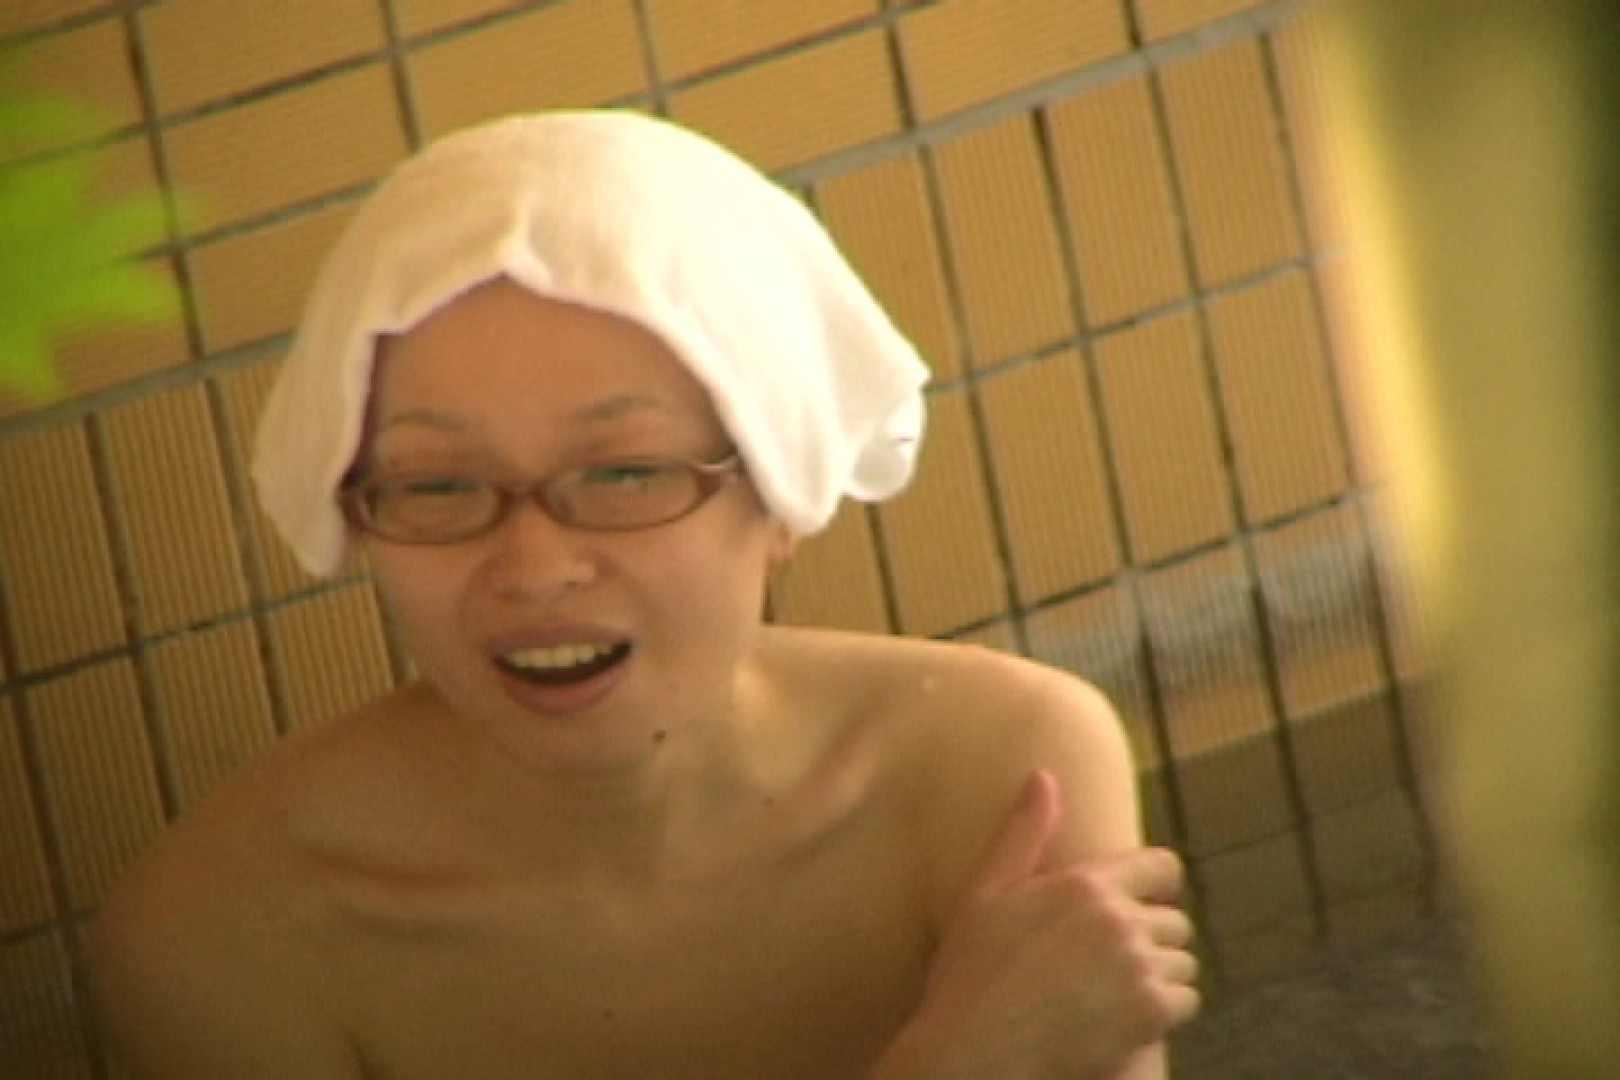 Aquaな露天風呂Vol.703 盗撮 のぞき動画画像 74連発 47